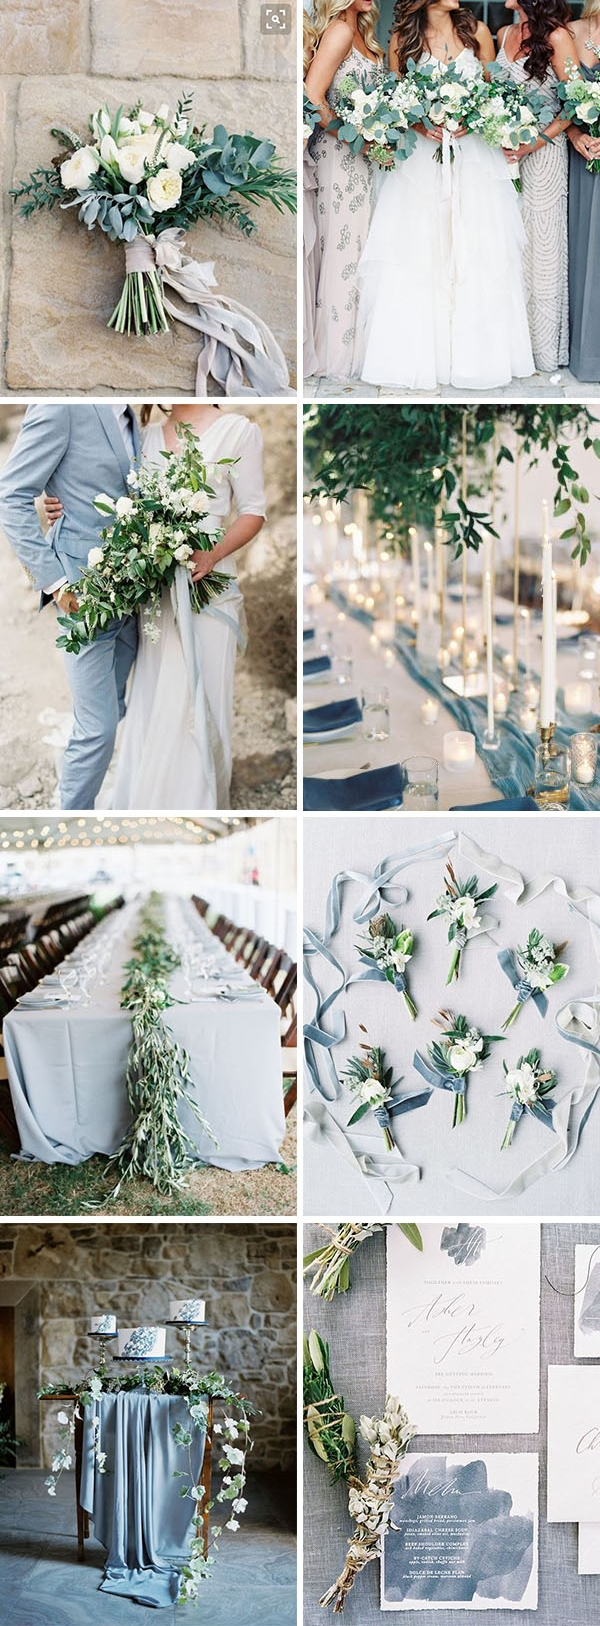 dusky-blues-neutral-shades-organic-wedding-color-palette-ideas-for-all-seasons-1.jpg